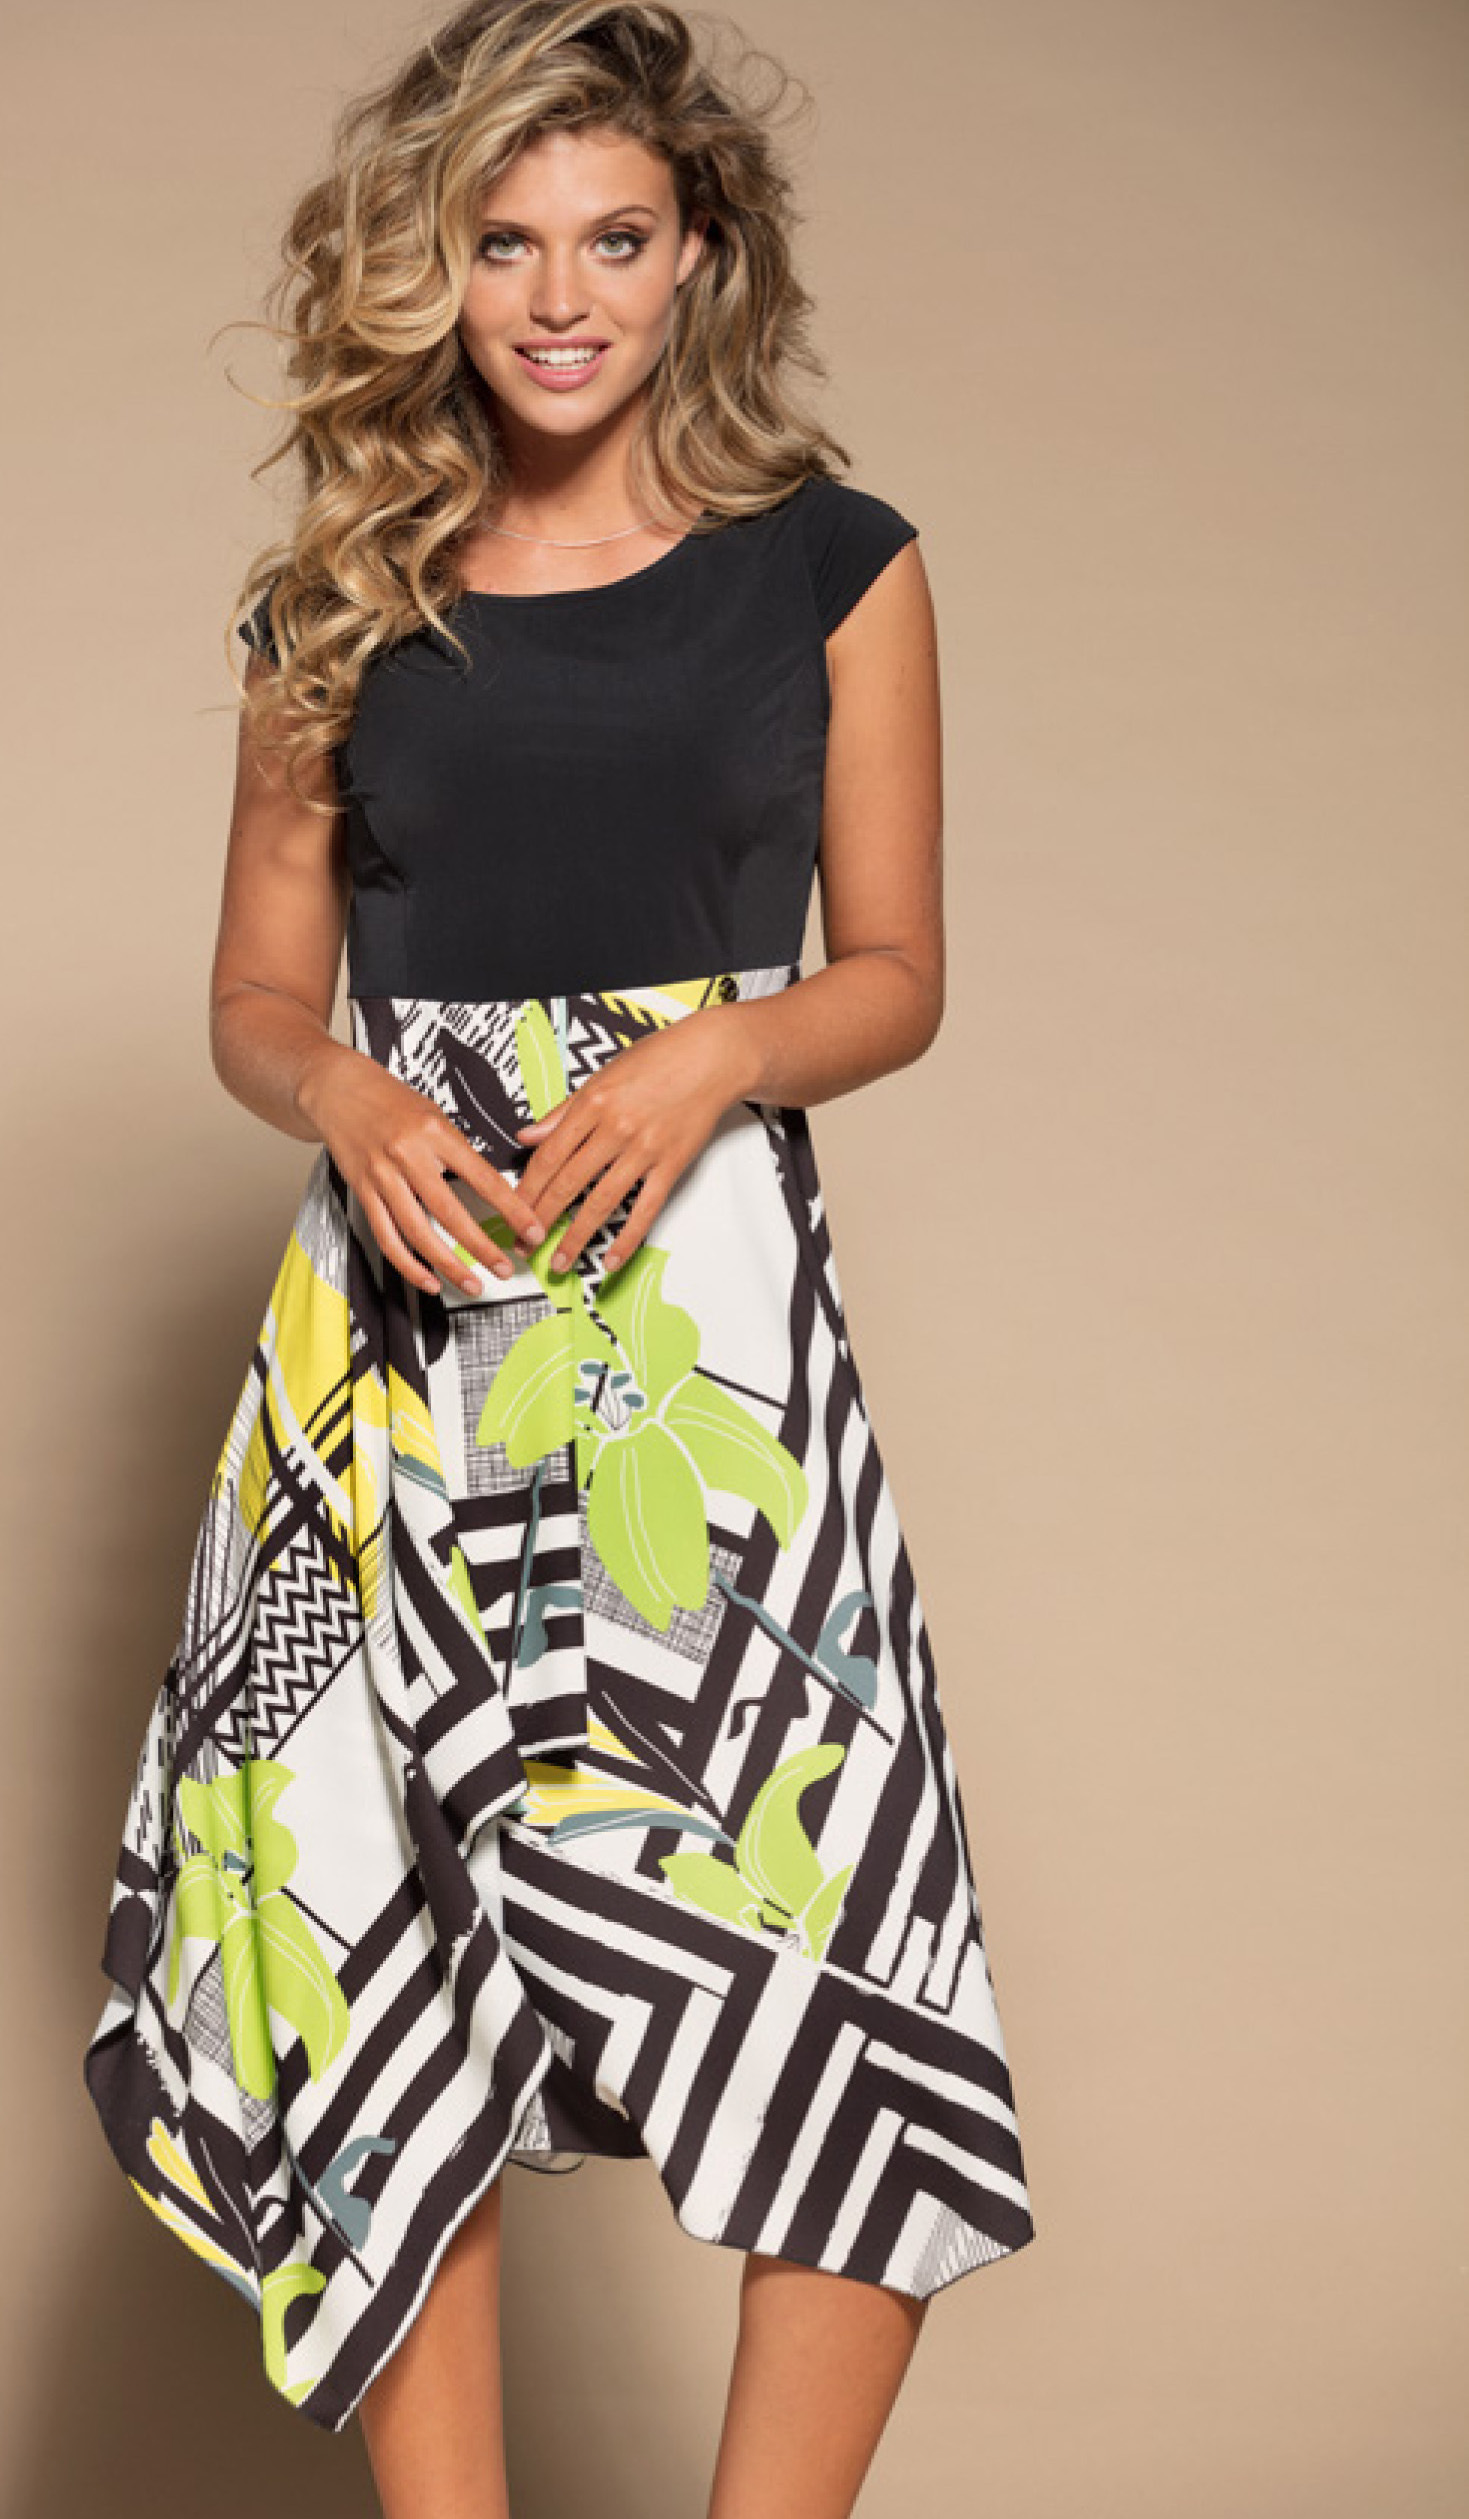 Maloka: Lemon Lime Marble High Waisted Asymmetrical Midi dress MK_NELY_N1